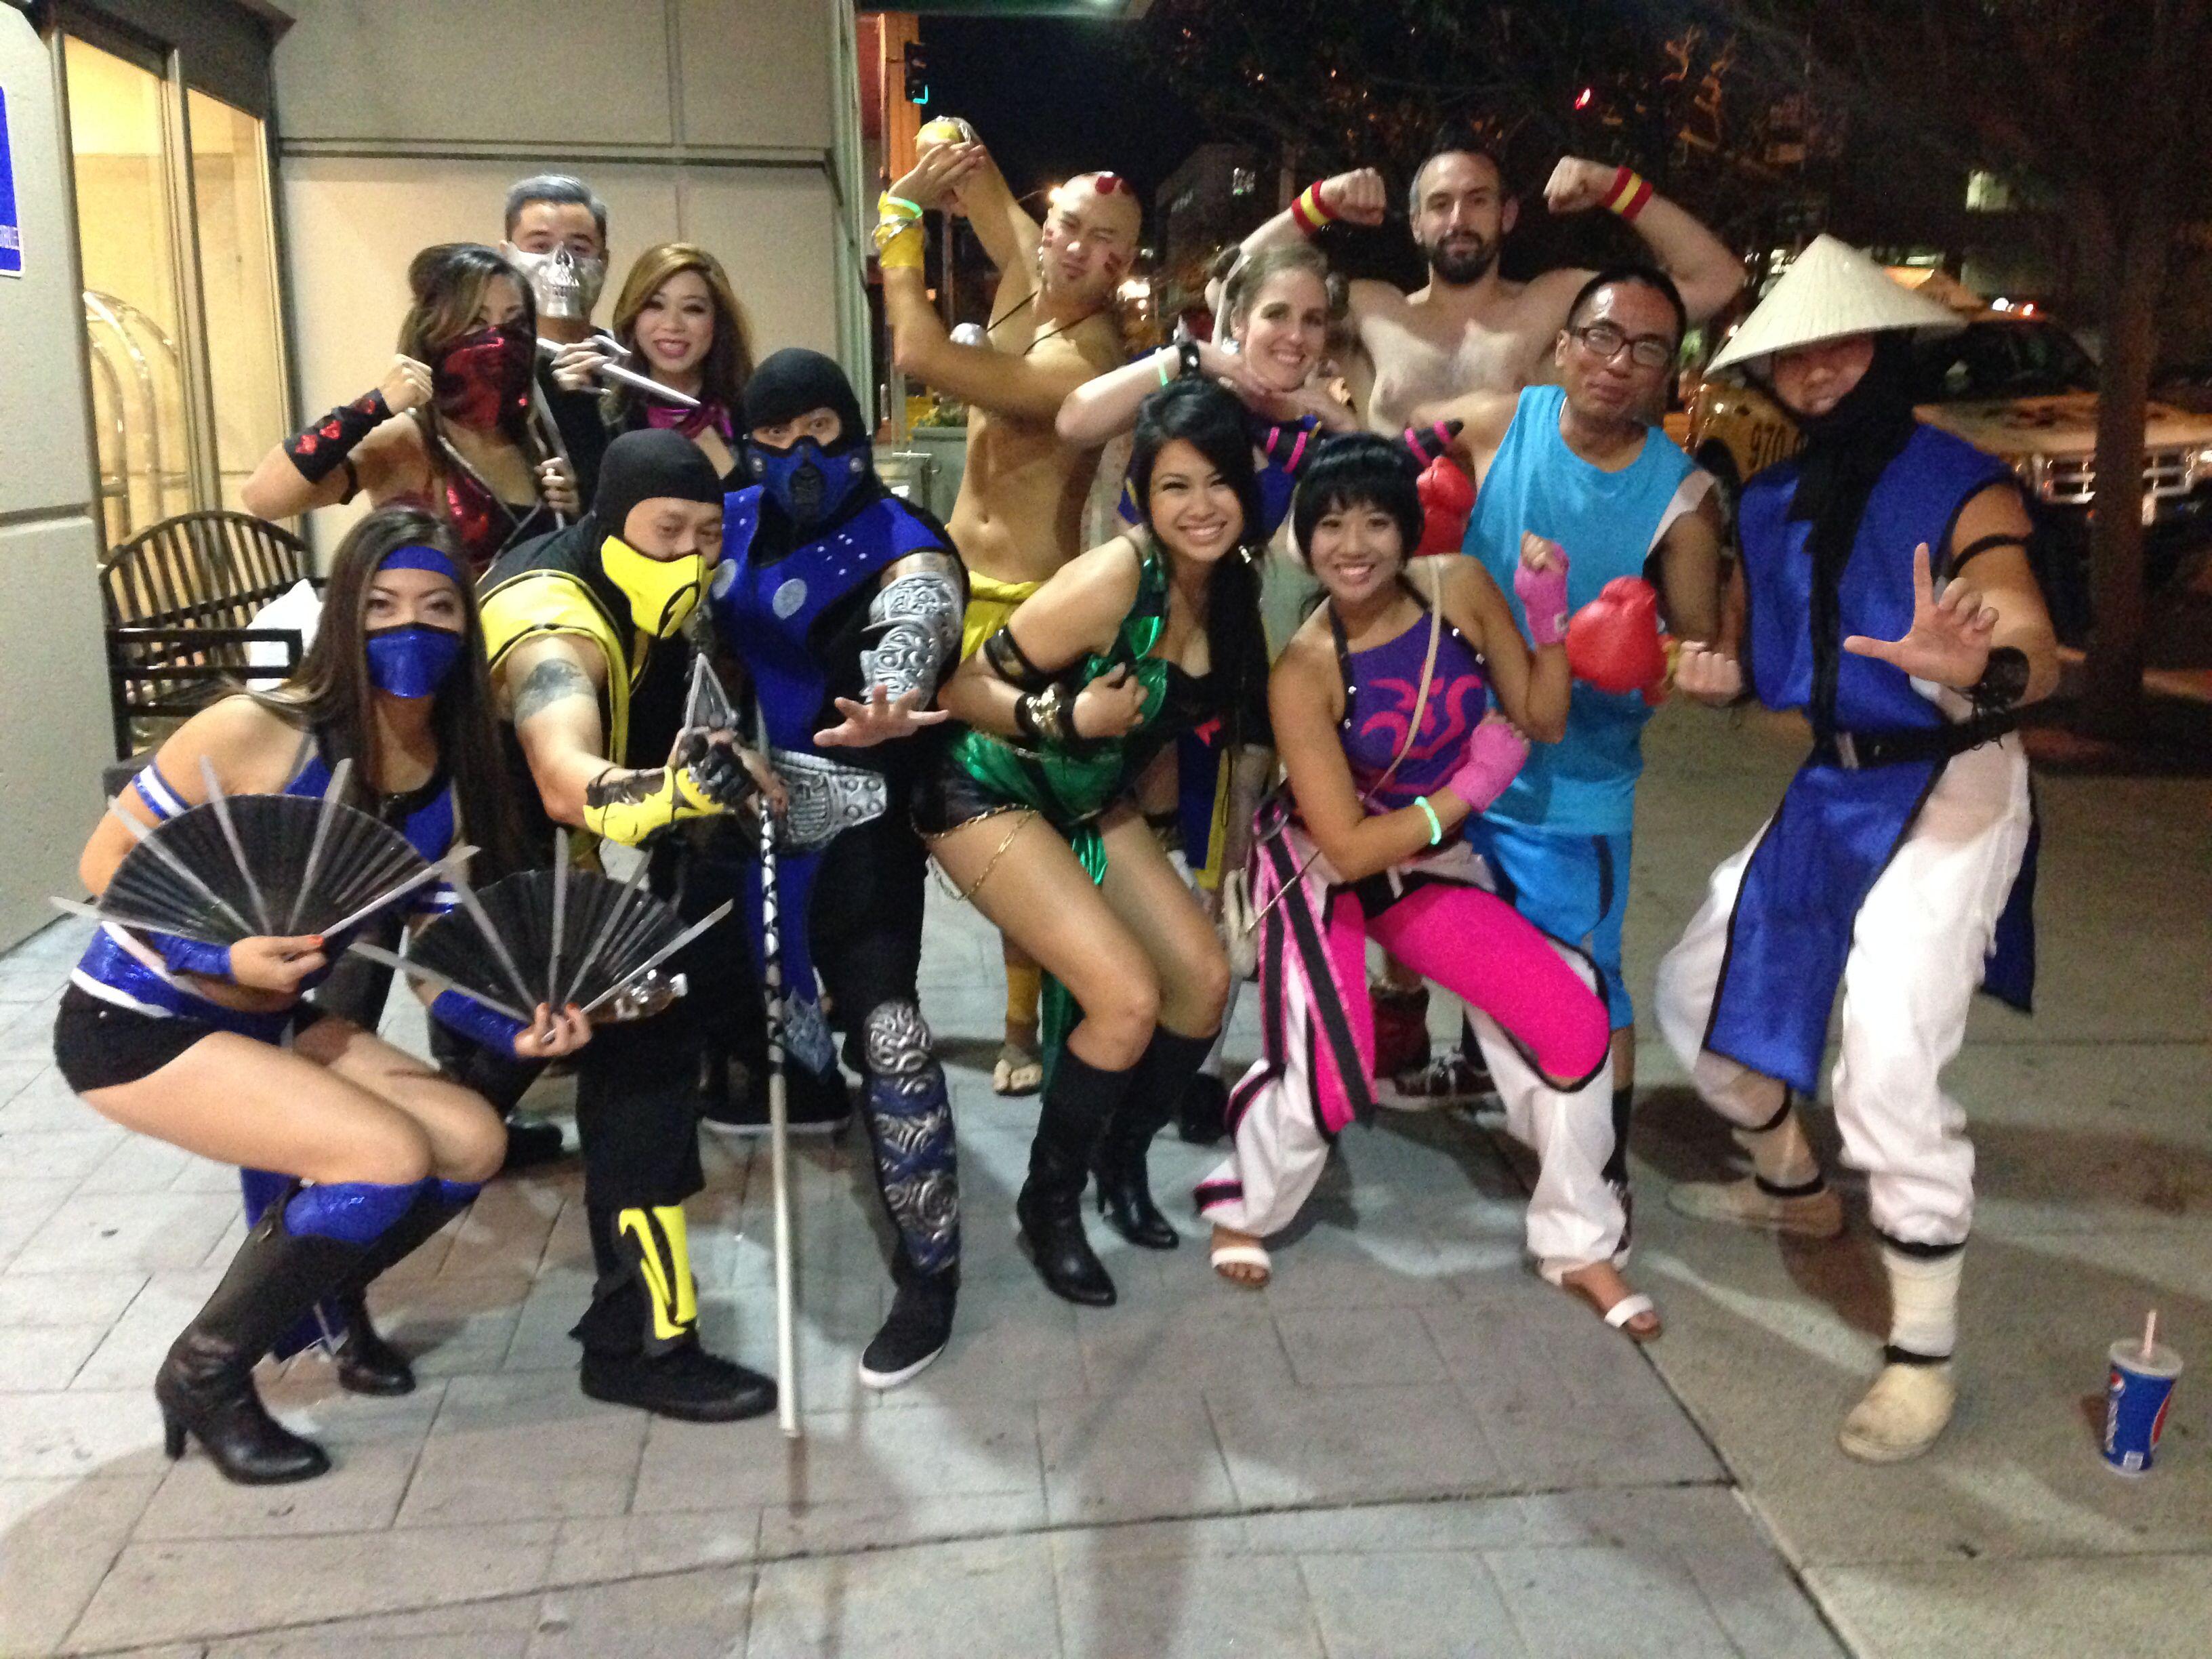 mortal kombat vs street fighter diy costume subzero scorpion jade mileena - Mortal Kombat Smoke Halloween Costume